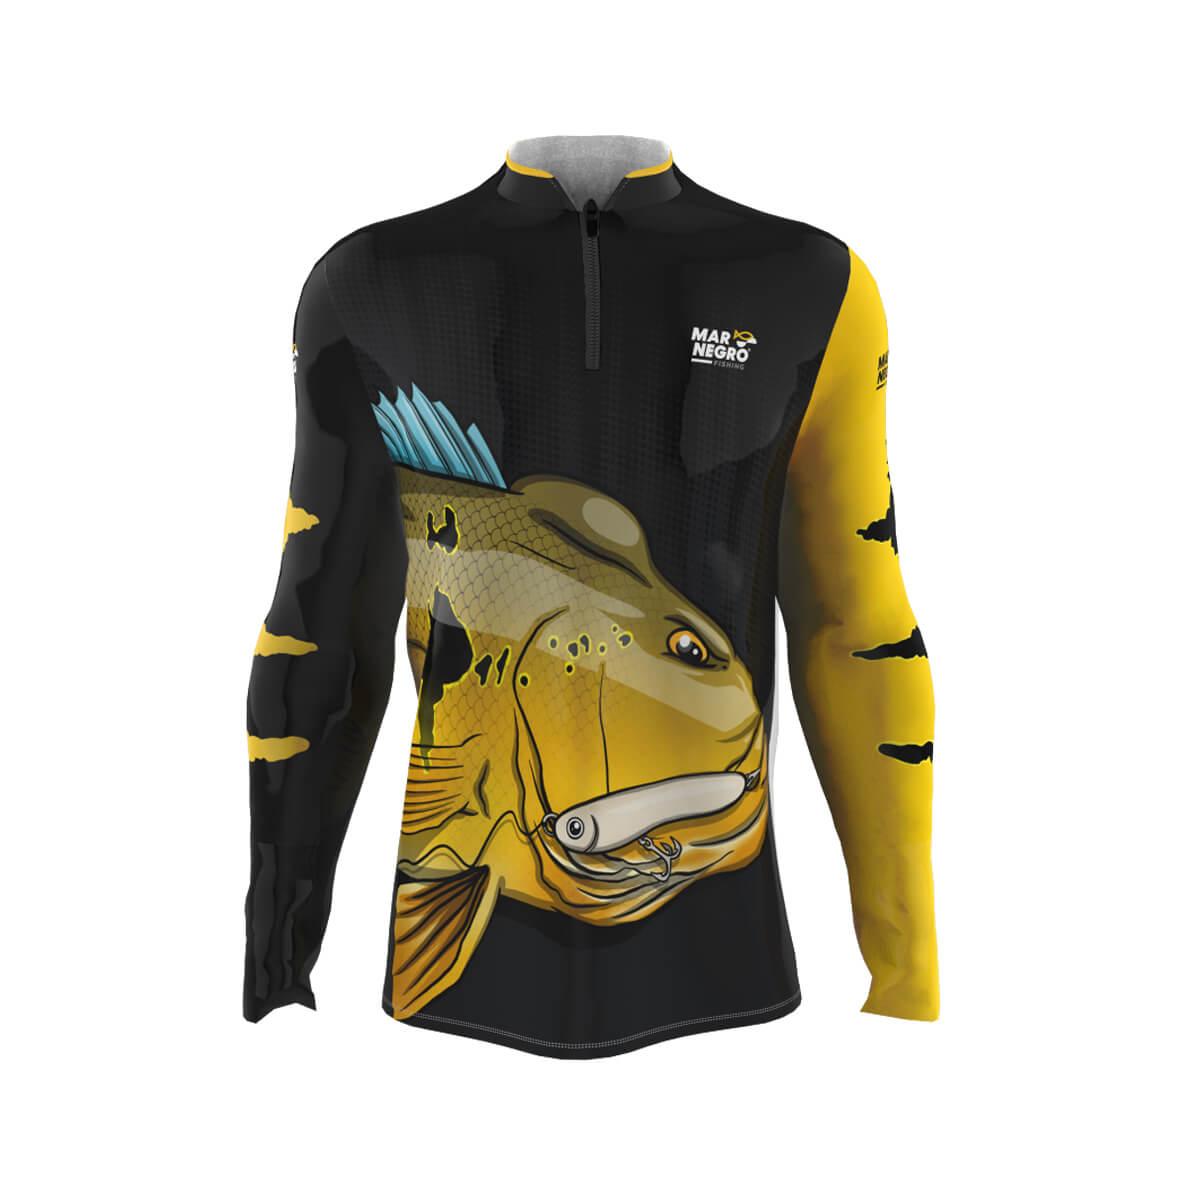 Camiseta Mar Negro 2021 Tucunaré Pinima  - Pró Pesca Shop